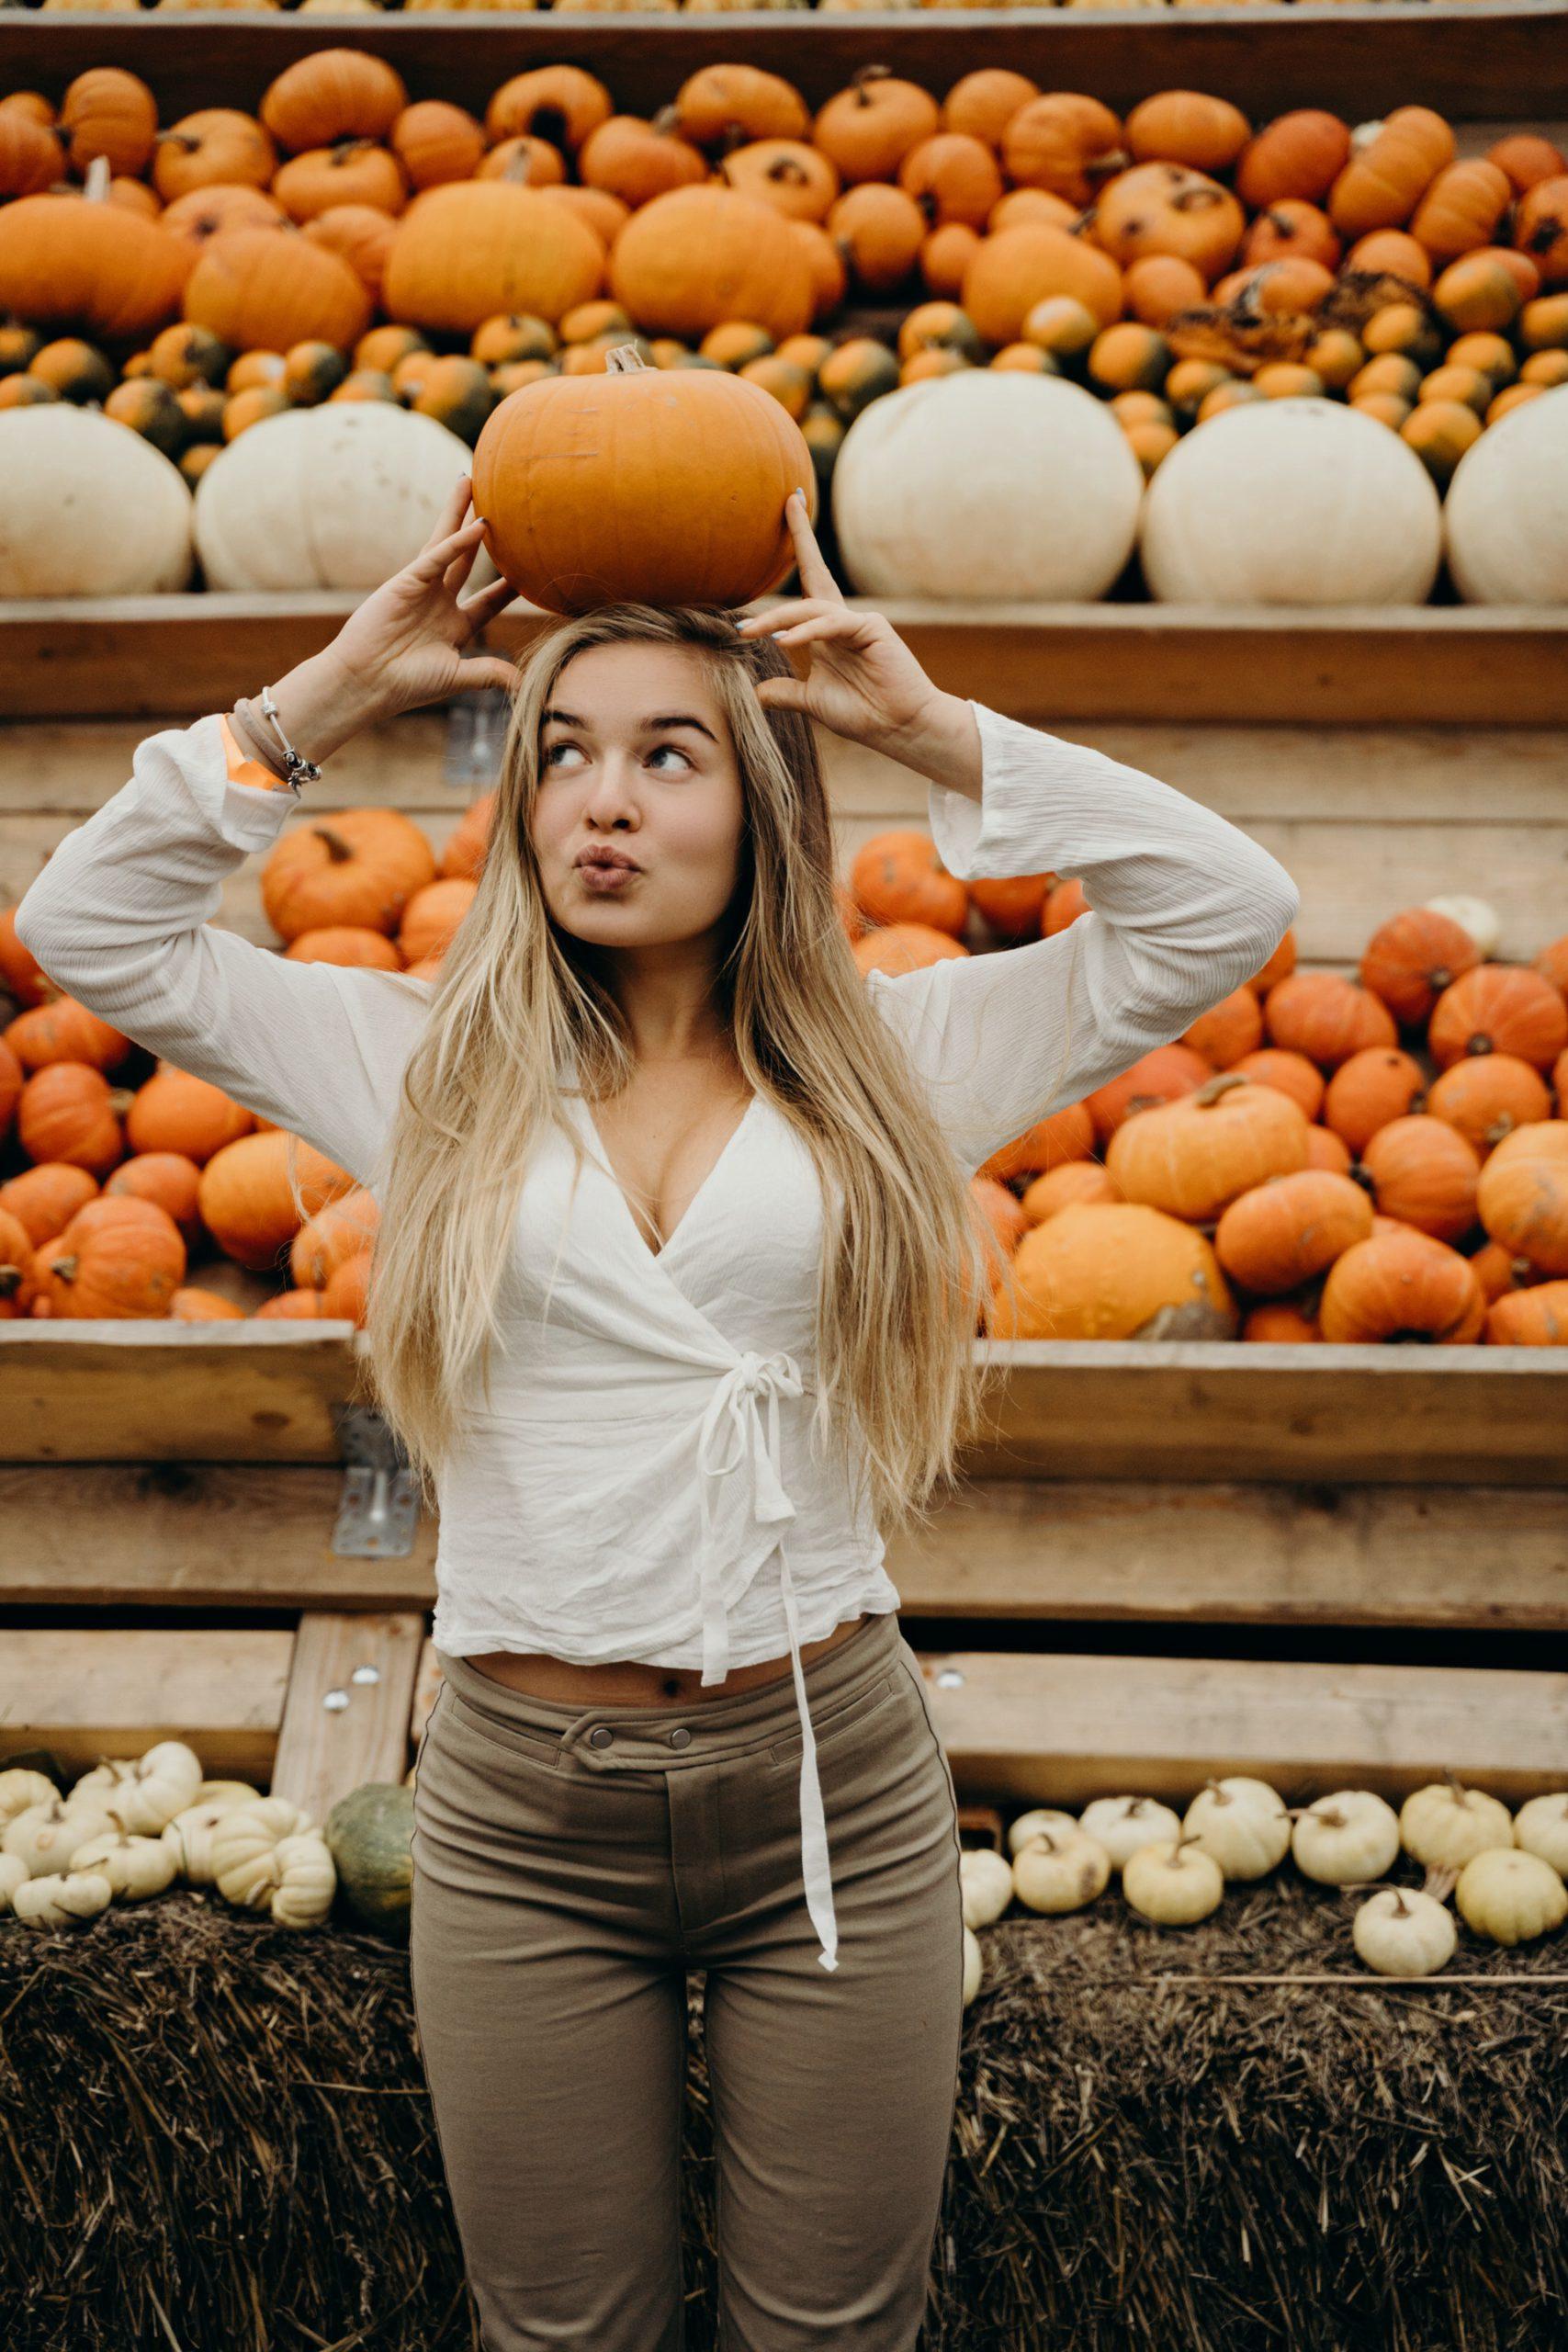 Photo of Girl Balancing a Pumpkin on Her Head